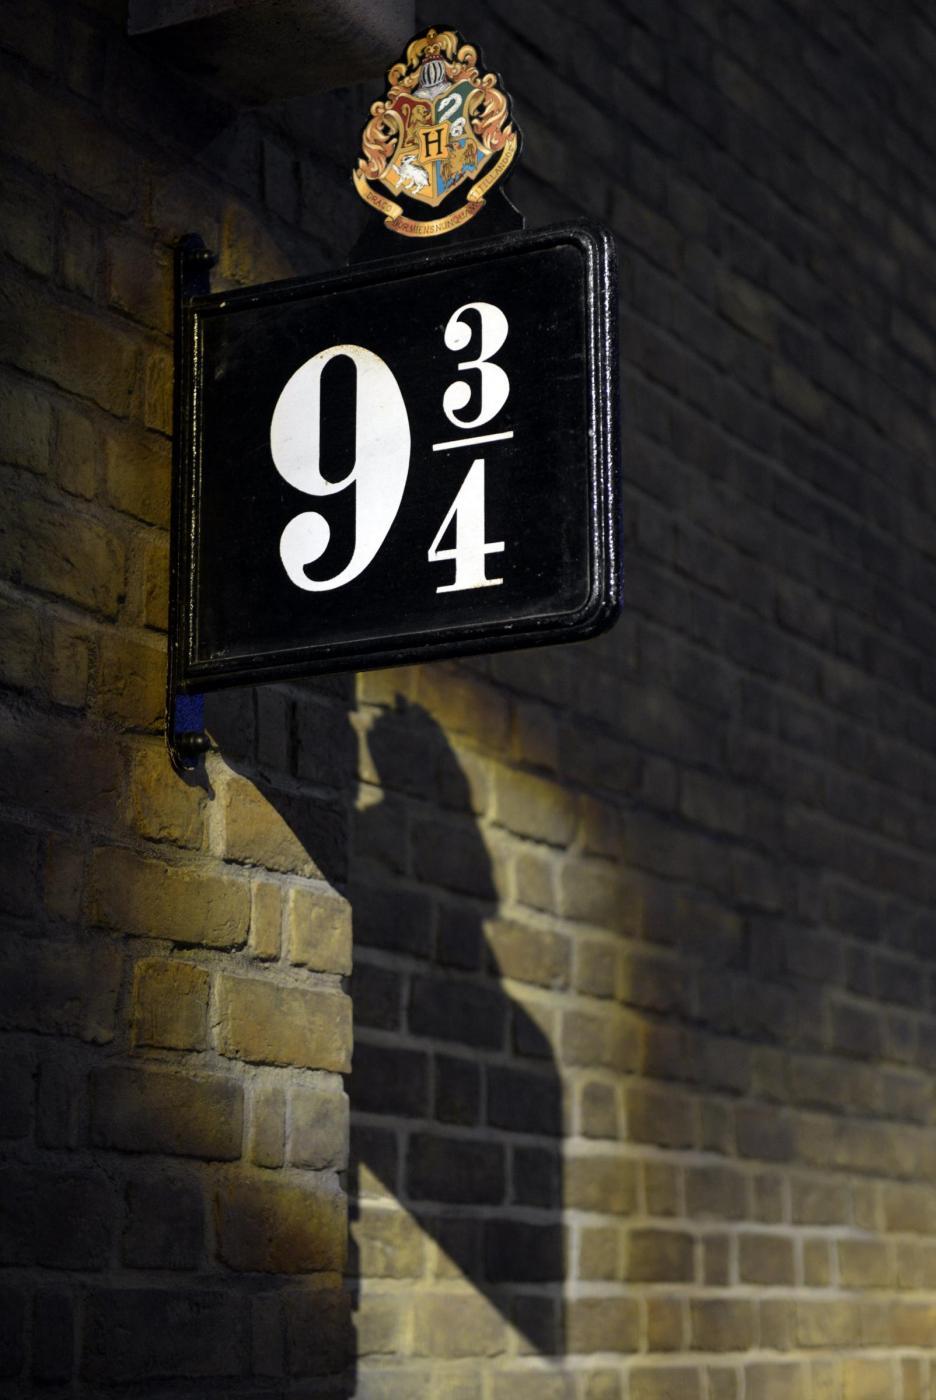 Harry Potter, curiosità su JK Rowling